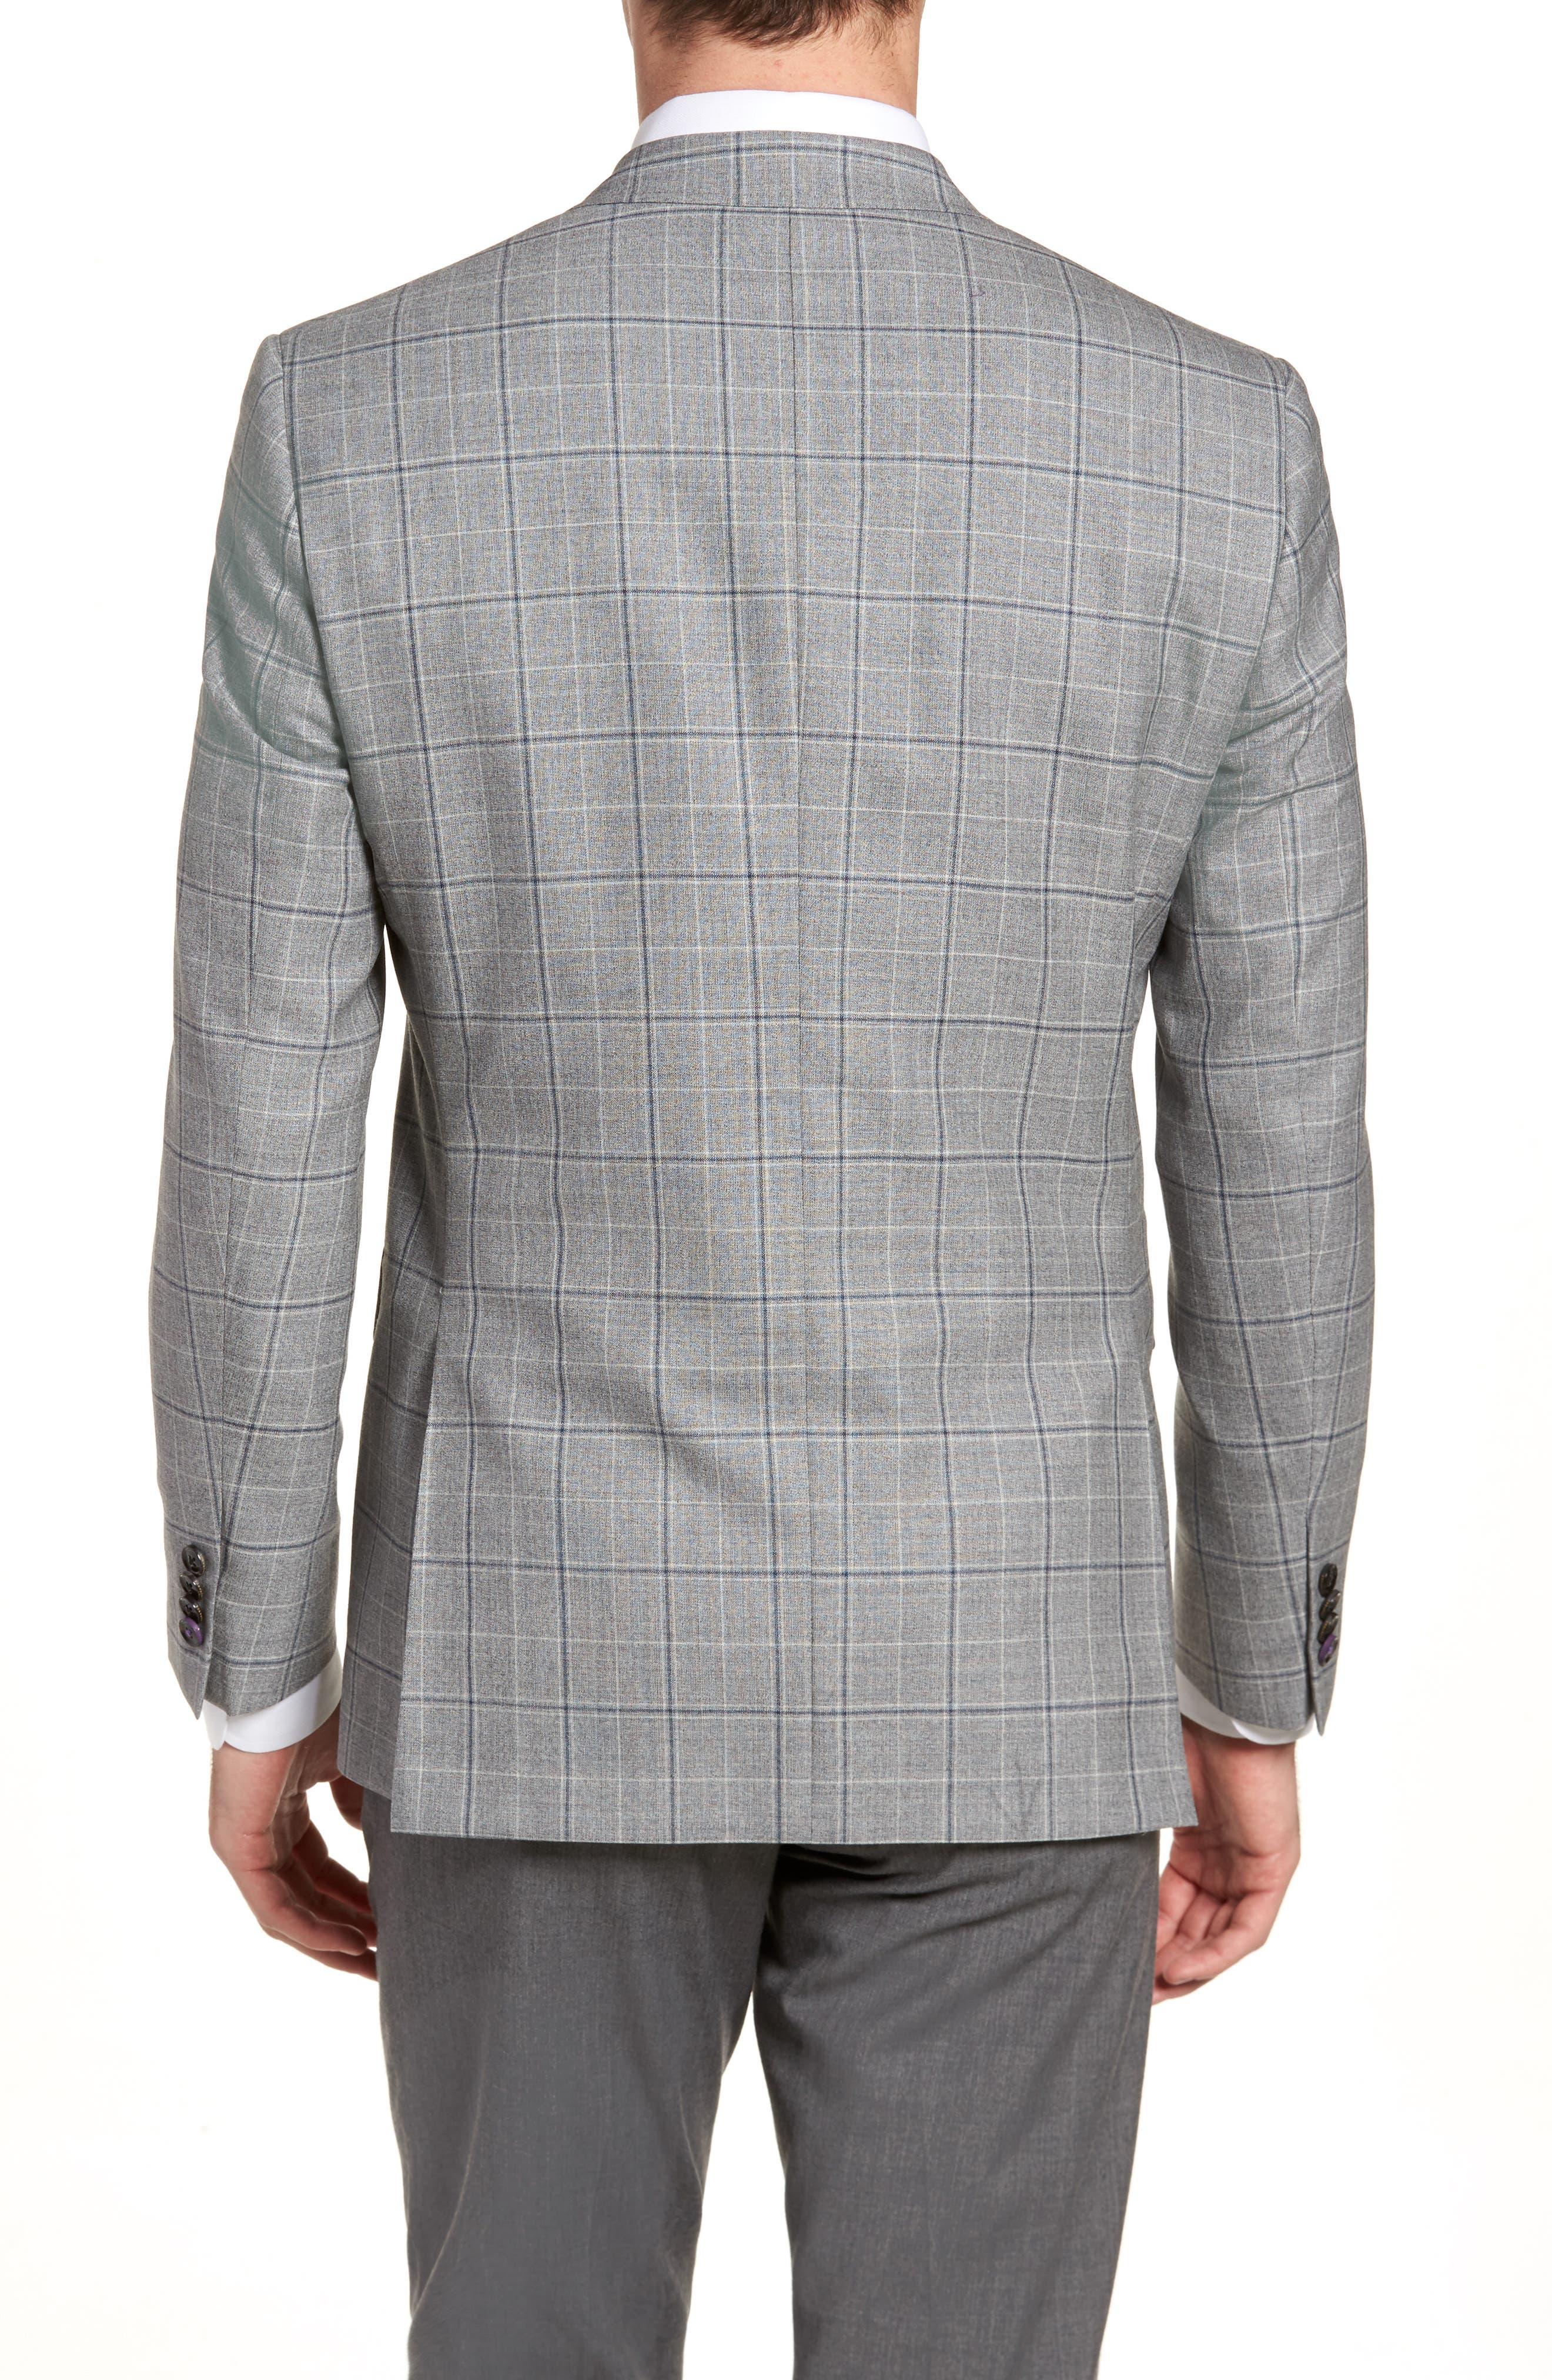 Jay Trim Fit Plaid Wool Sport Coat,                             Alternate thumbnail 2, color,                             Light Grey